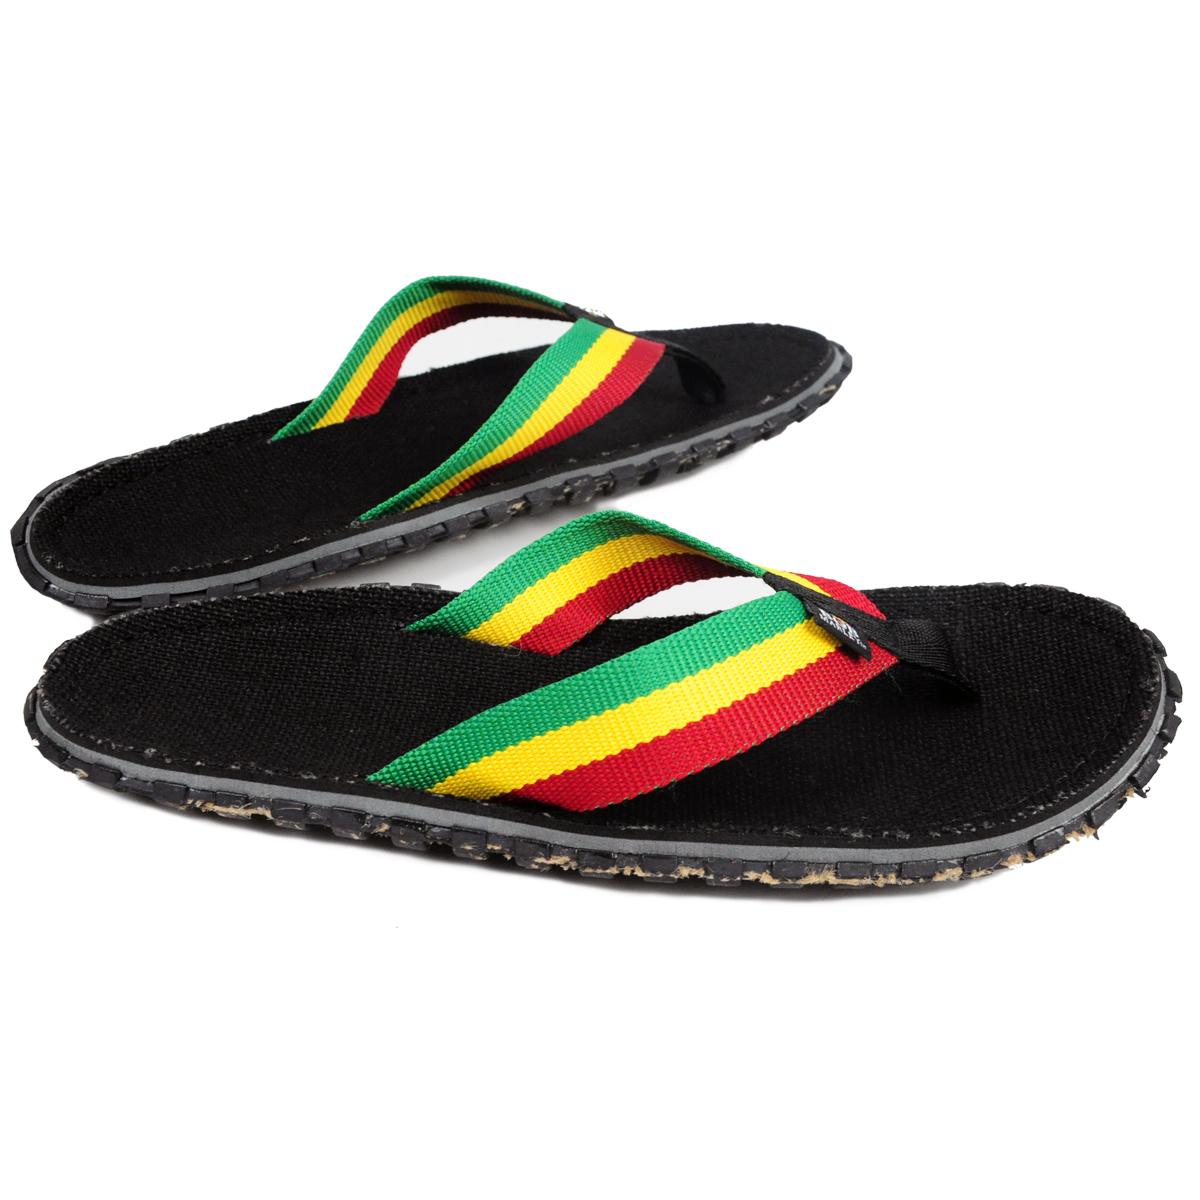 Bob Marley Slip On Shoes